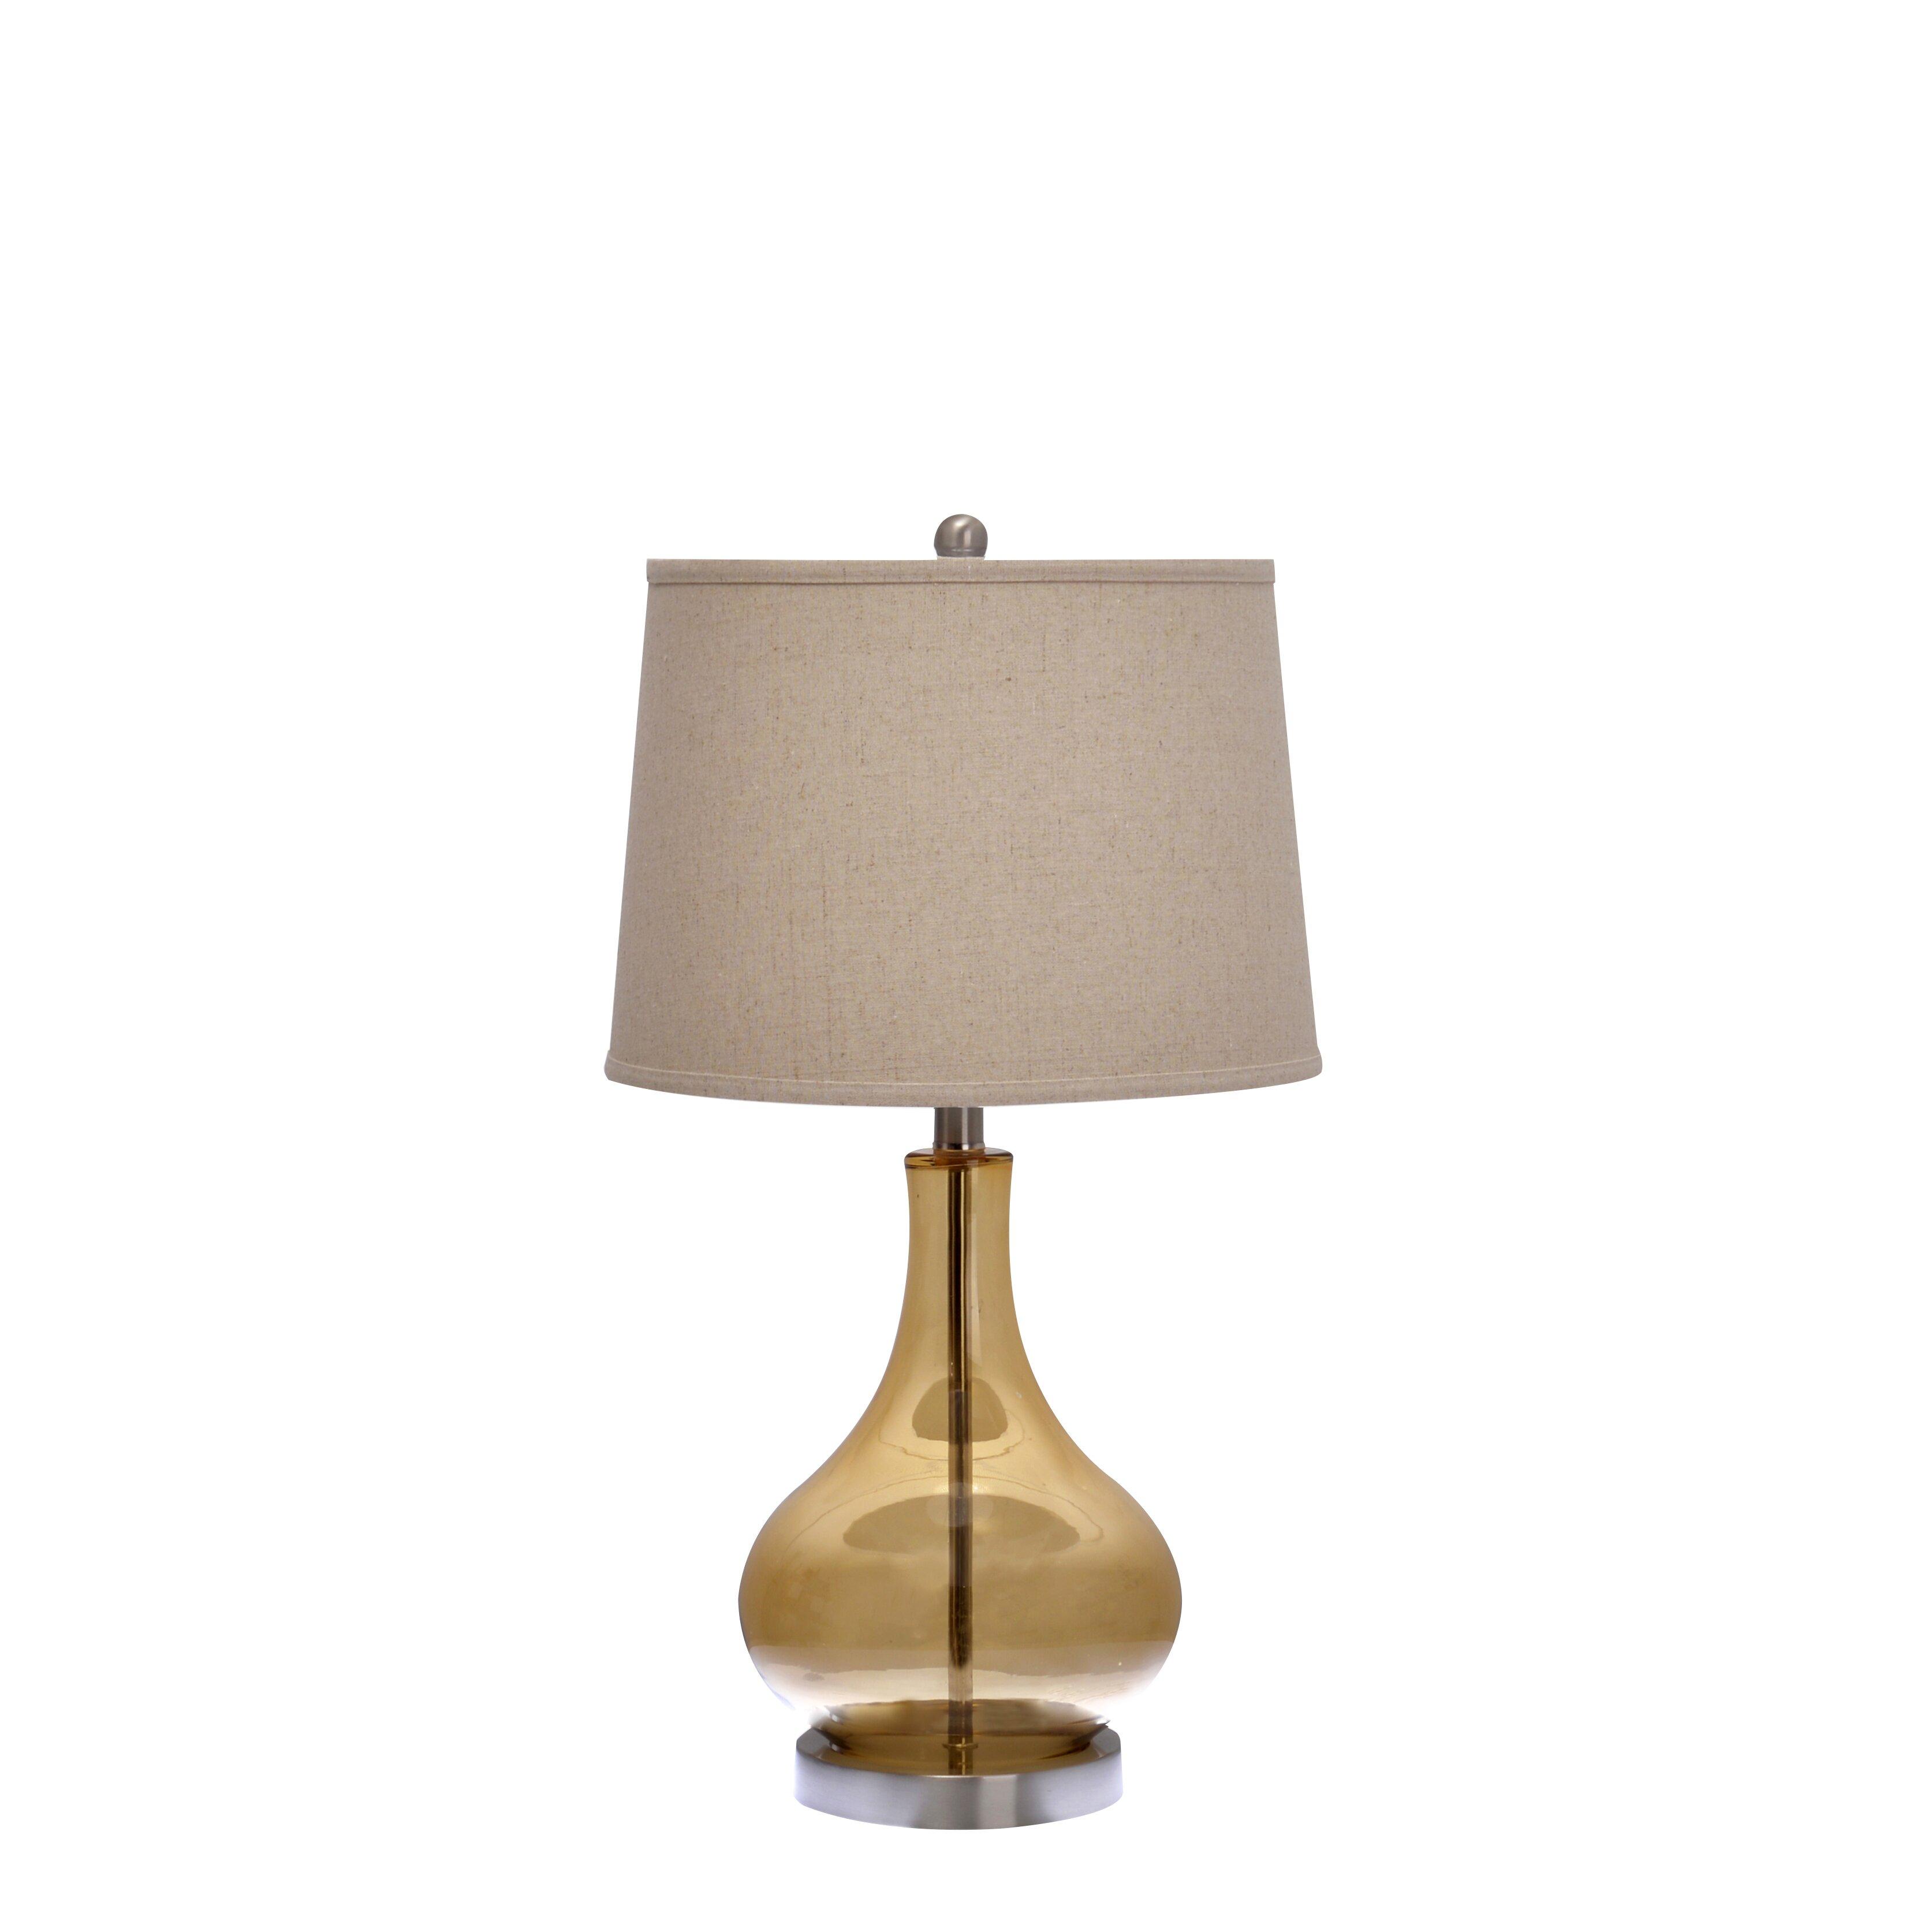 lighting lamps table lamps catalina lighting sku evi1141. Black Bedroom Furniture Sets. Home Design Ideas